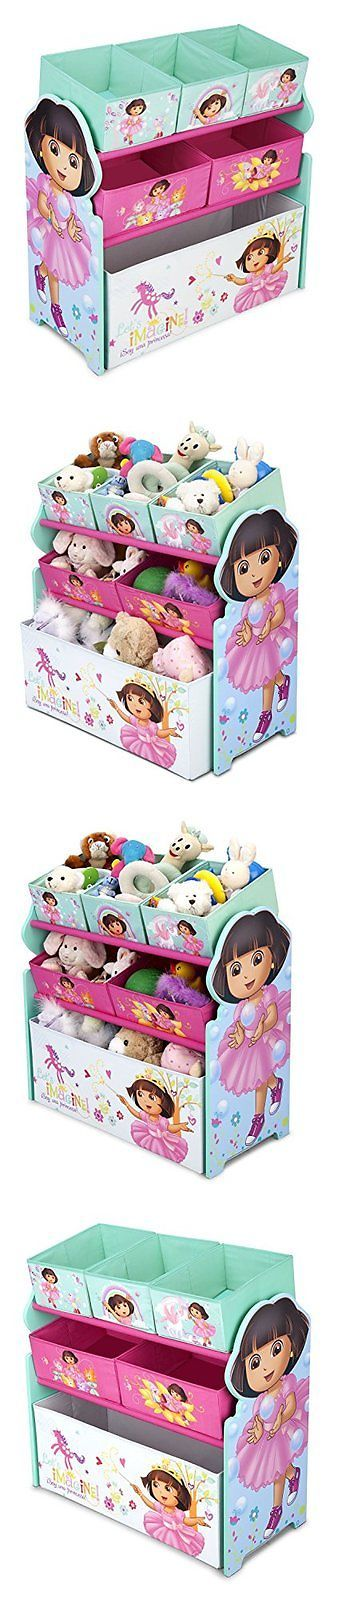 Toy Boxes 94932: Delta Children Multi-Bin Toy Organizer Nick Jr. Dora The Explorer -> BUY IT NOW ONLY: $37.58 on eBay!